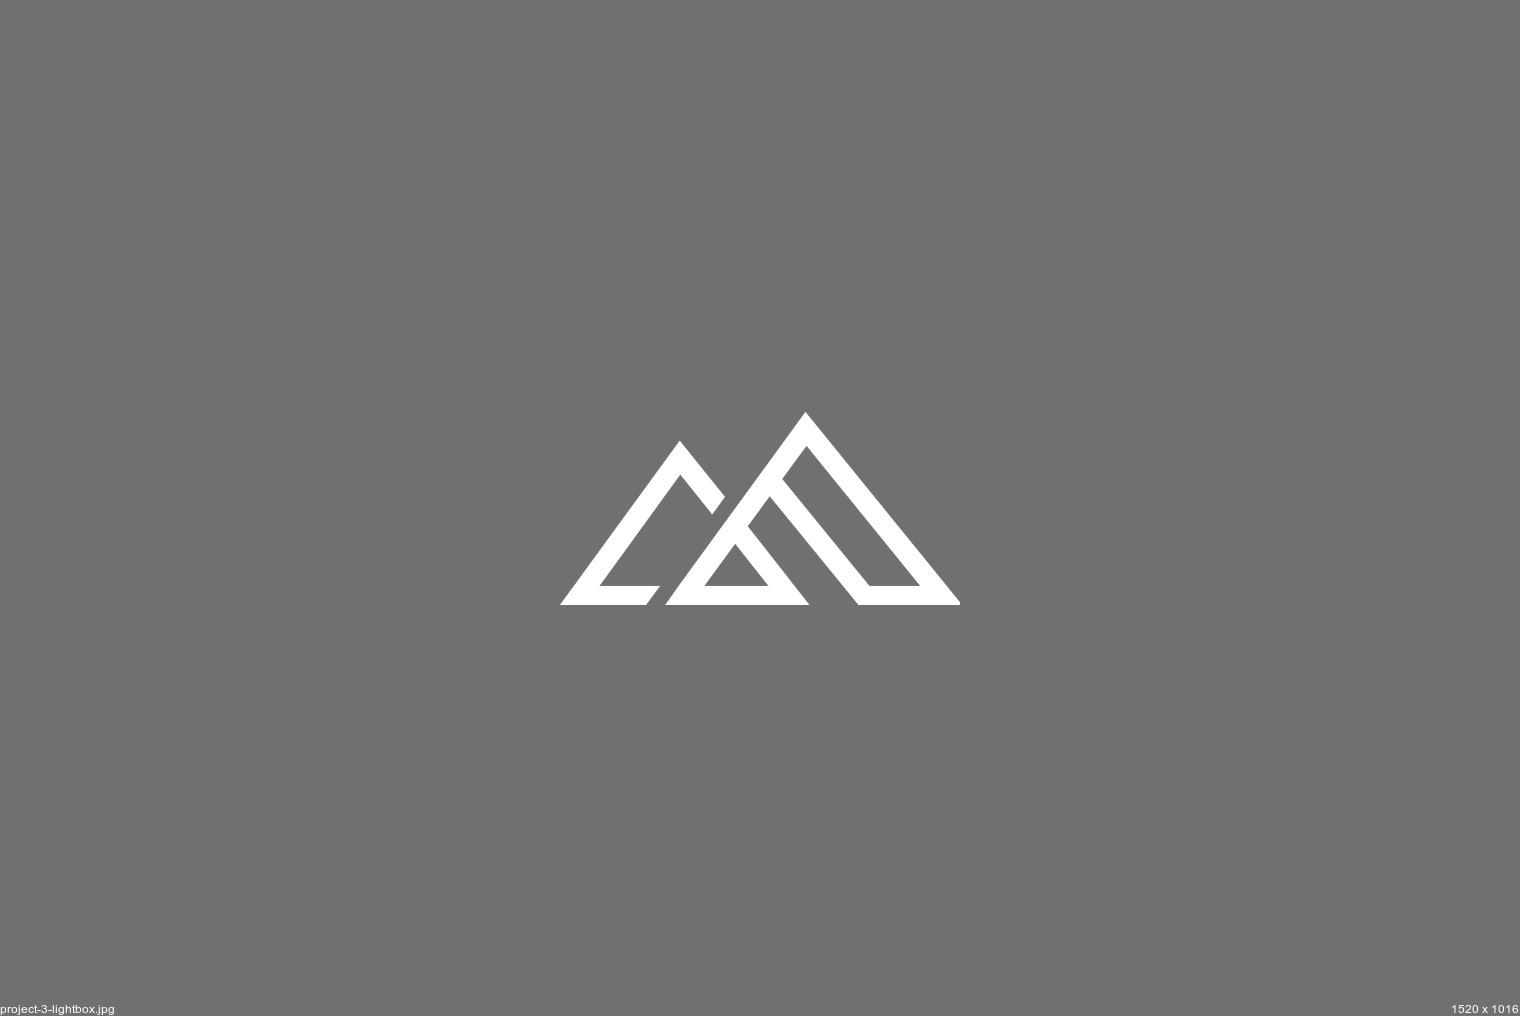 project-3-lightbox